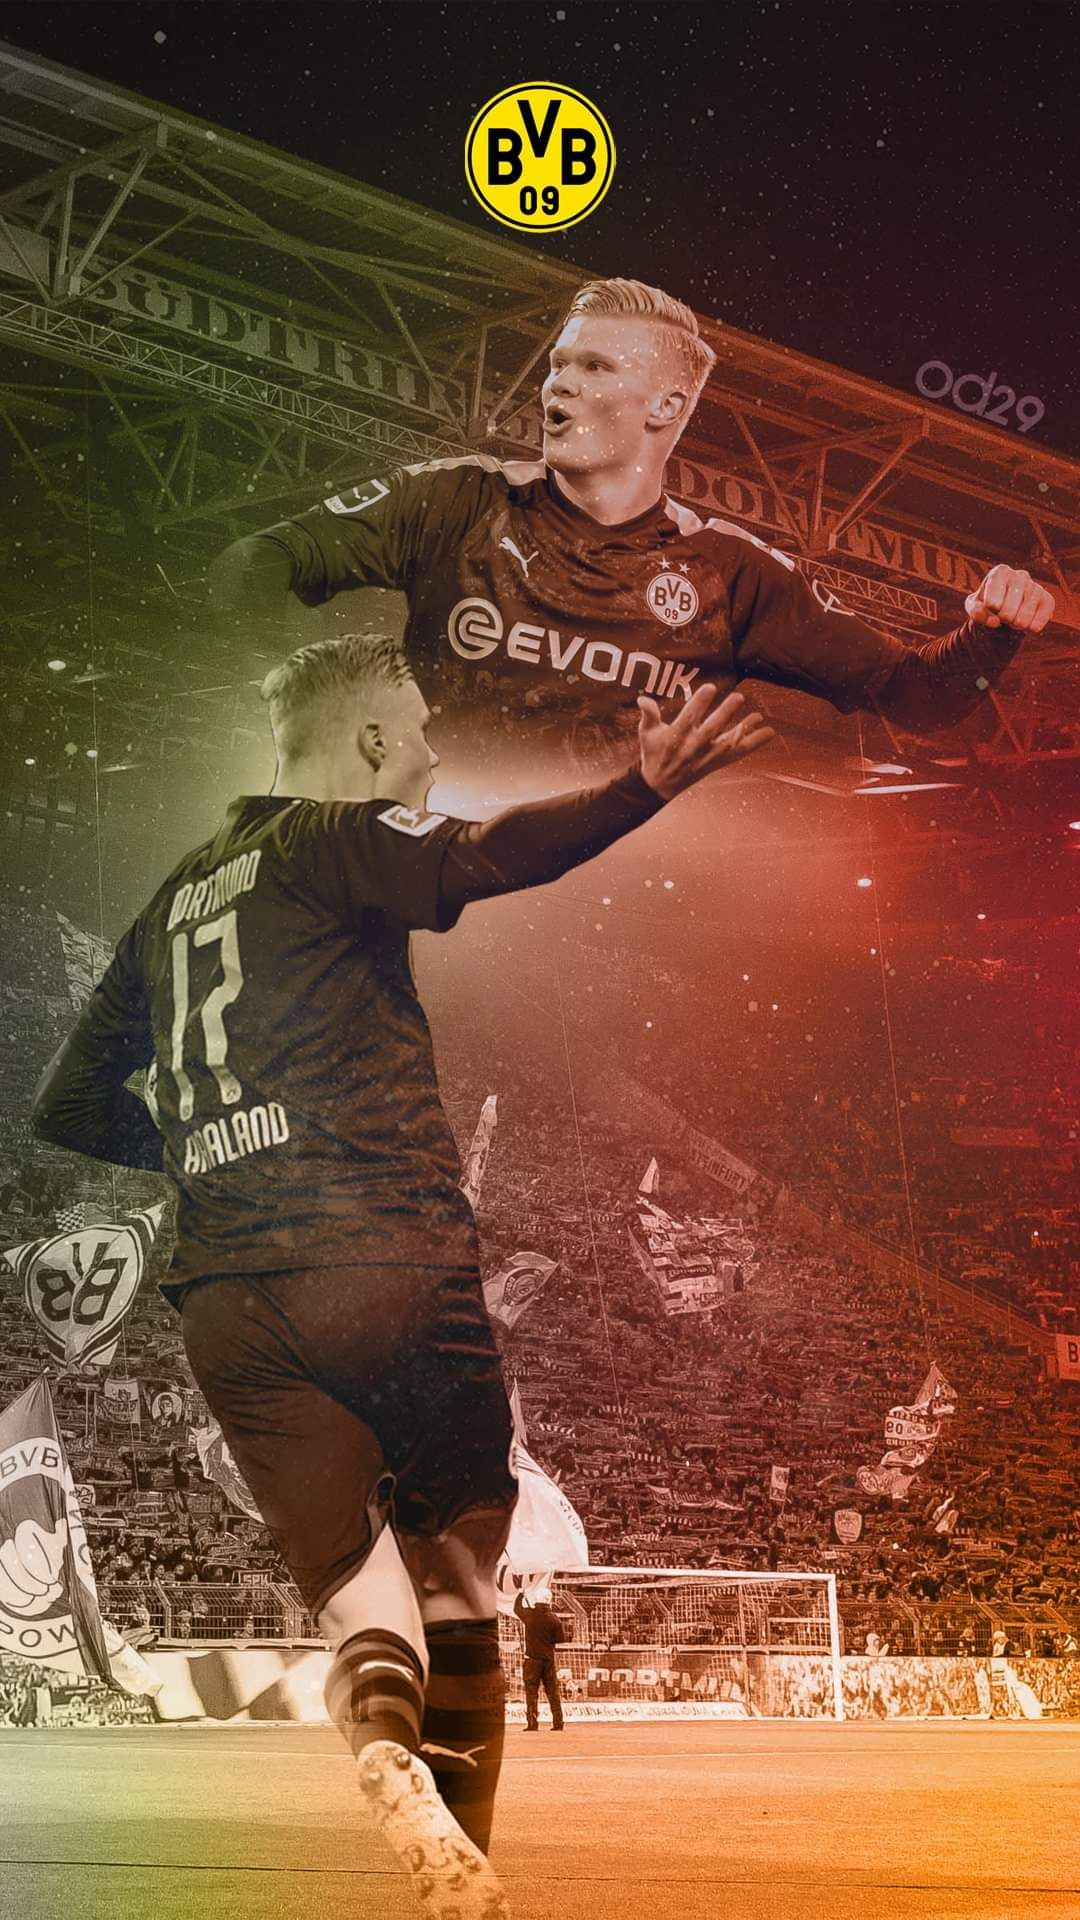 Haaland Bvb Dortmund Wallpaper In 2020 Bvb Dortmund Borussia Dortmund Wallpaper Bvb